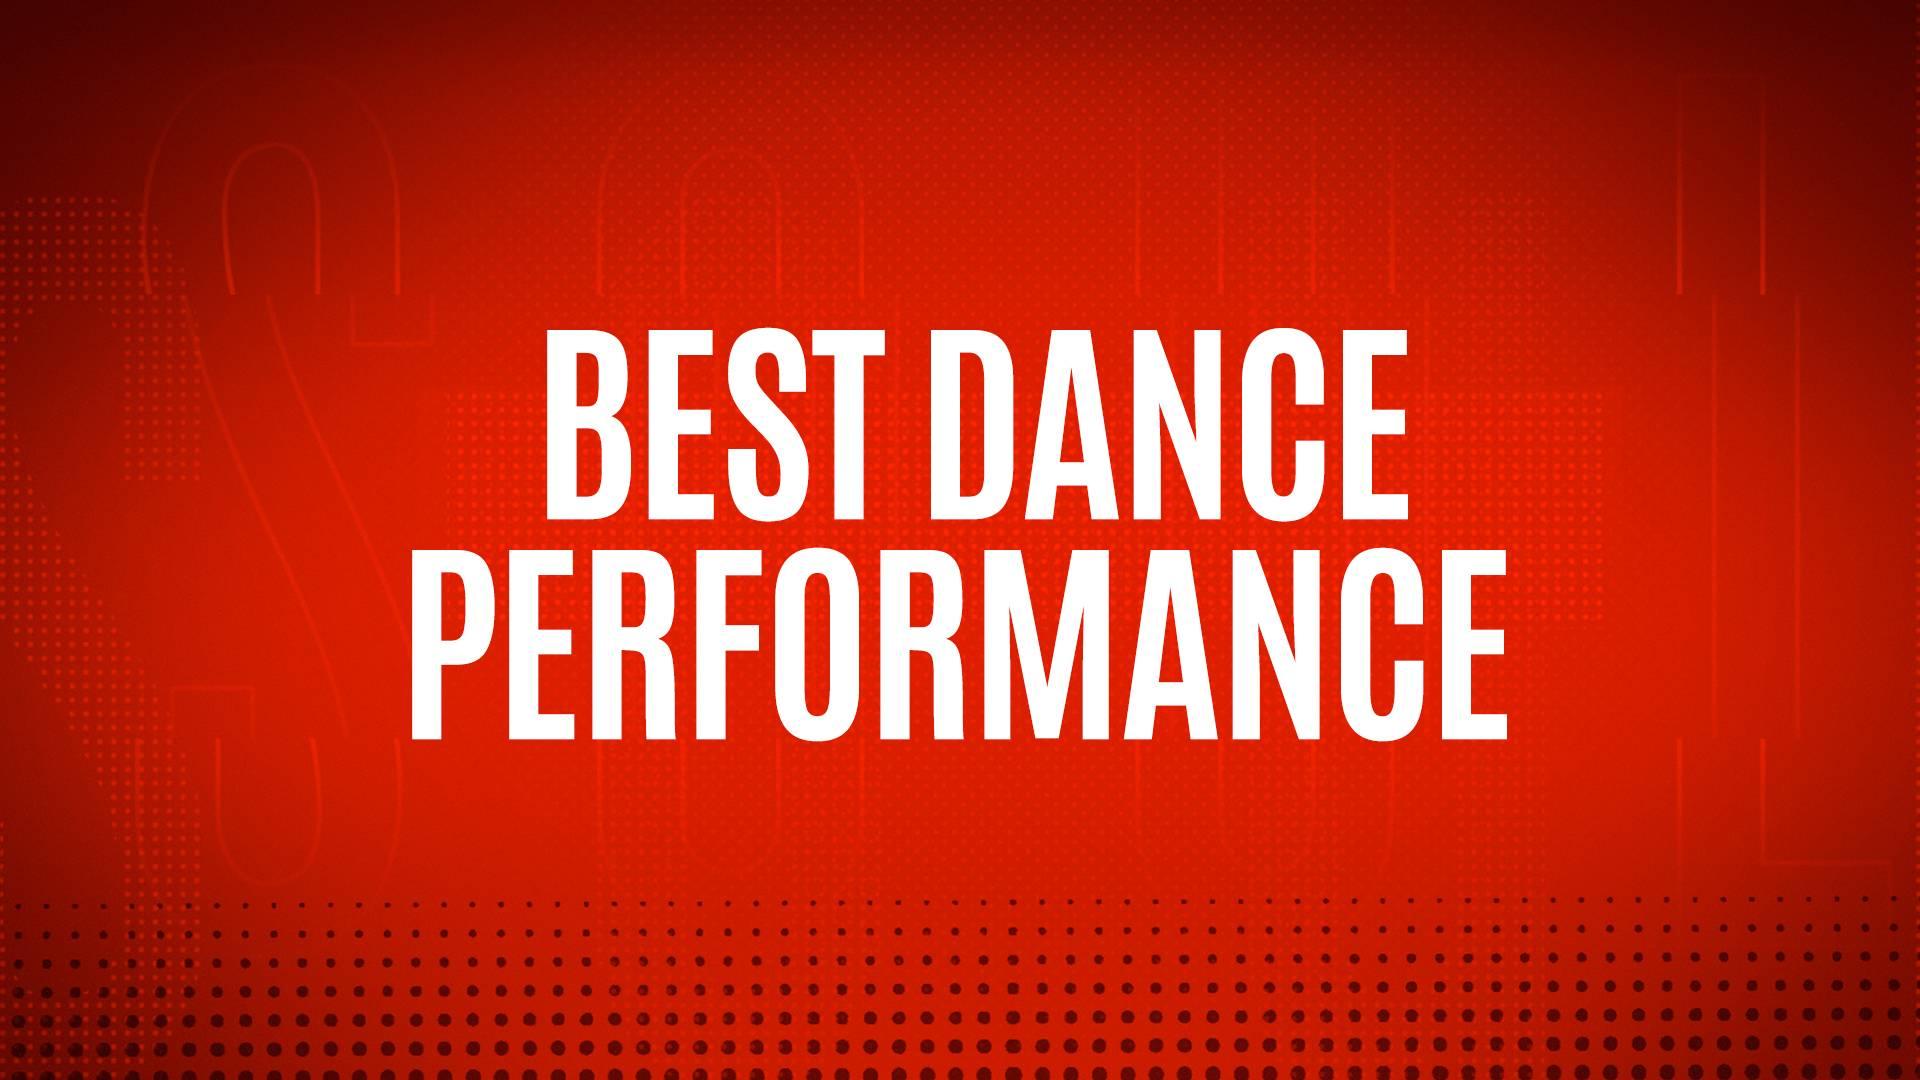 NOMINEES - BEST DANCE PERFORMANCE